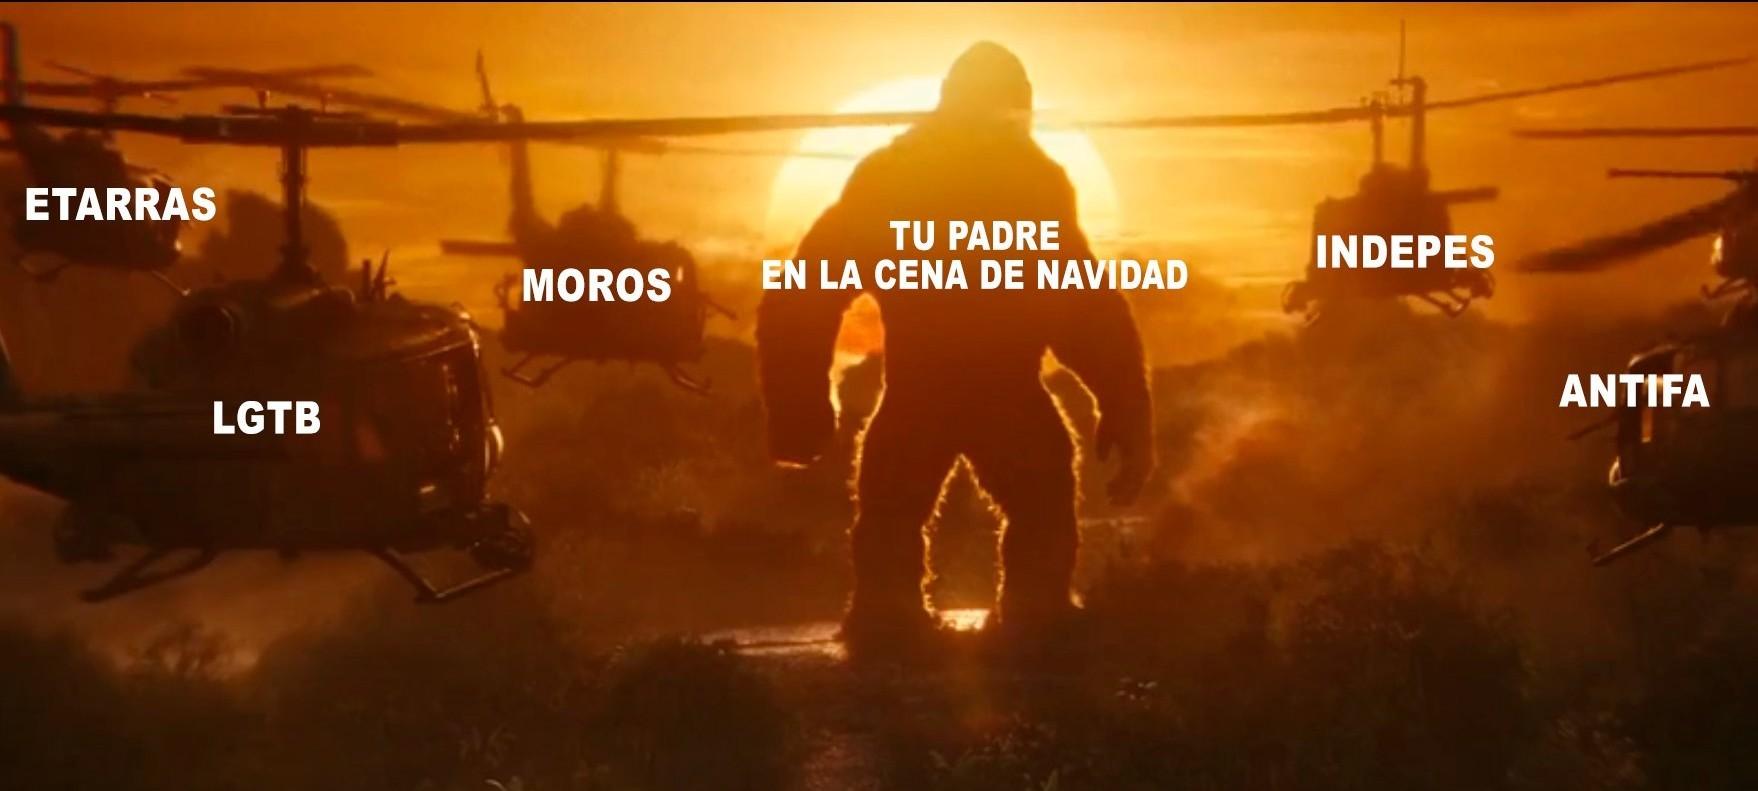 Kong, King Kong - meme